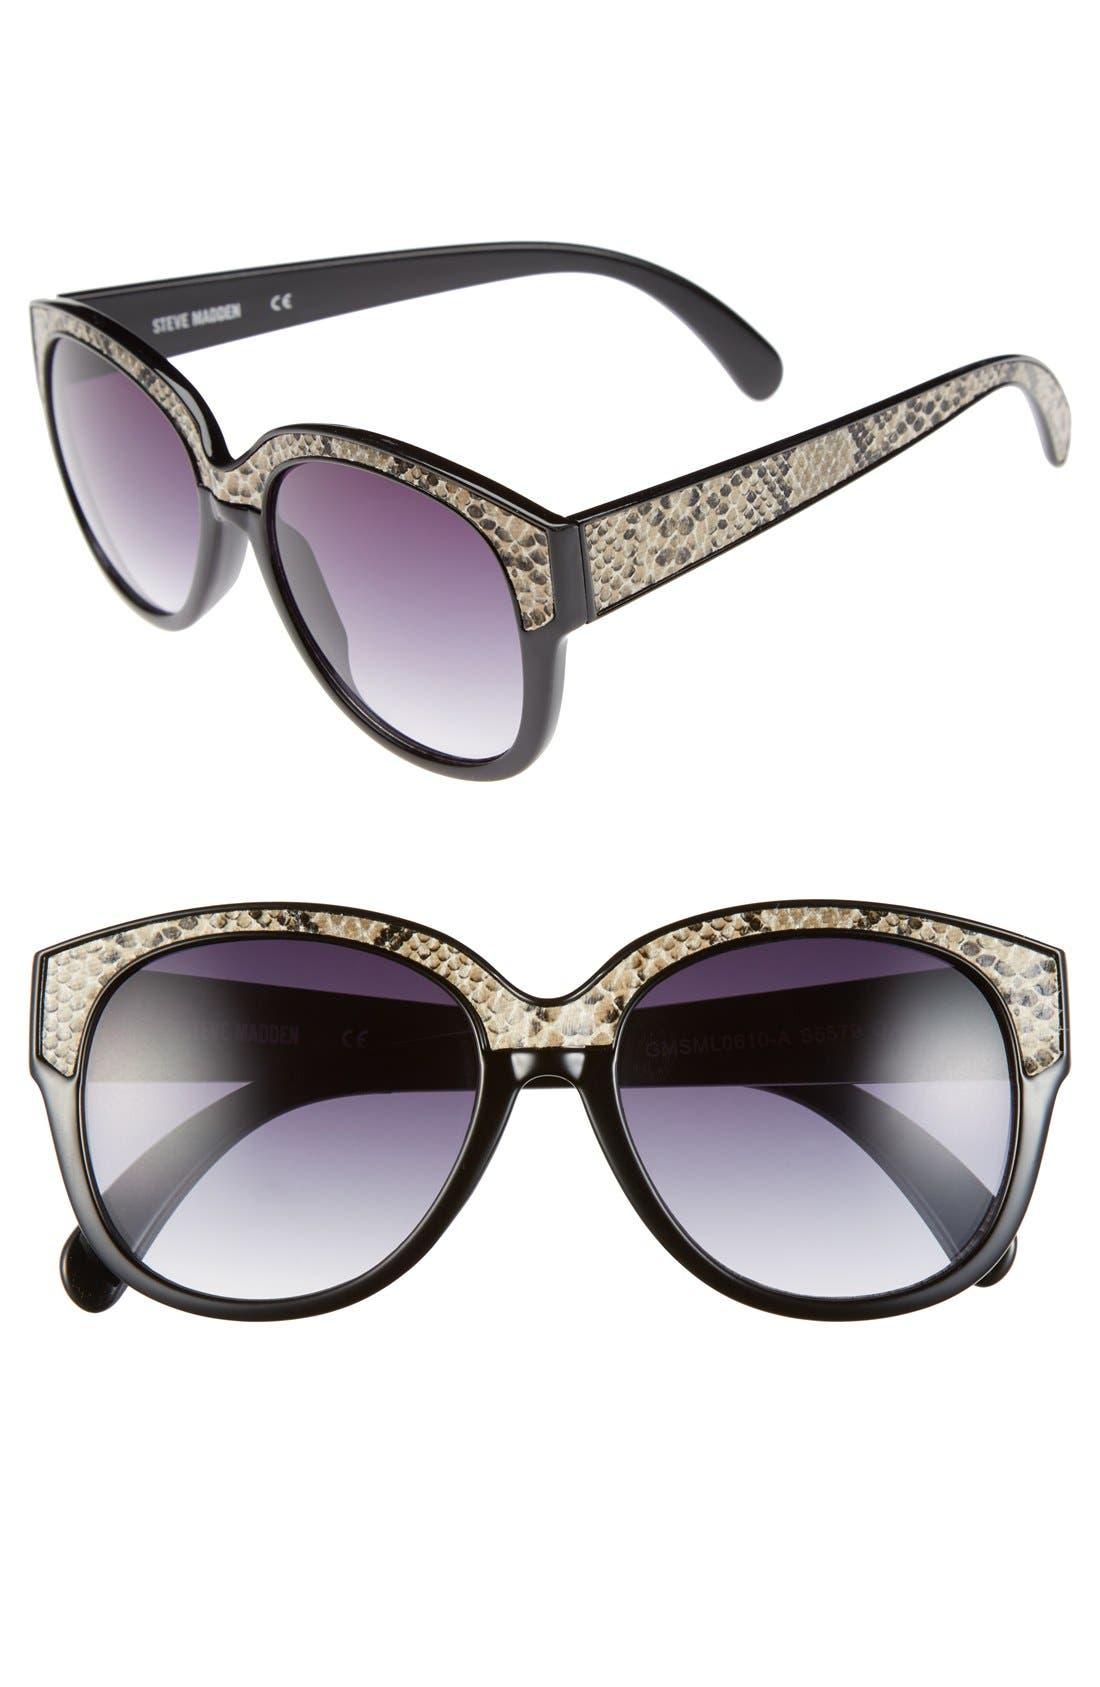 Main Image - Steve Madden 55mm Retro Sunglasses